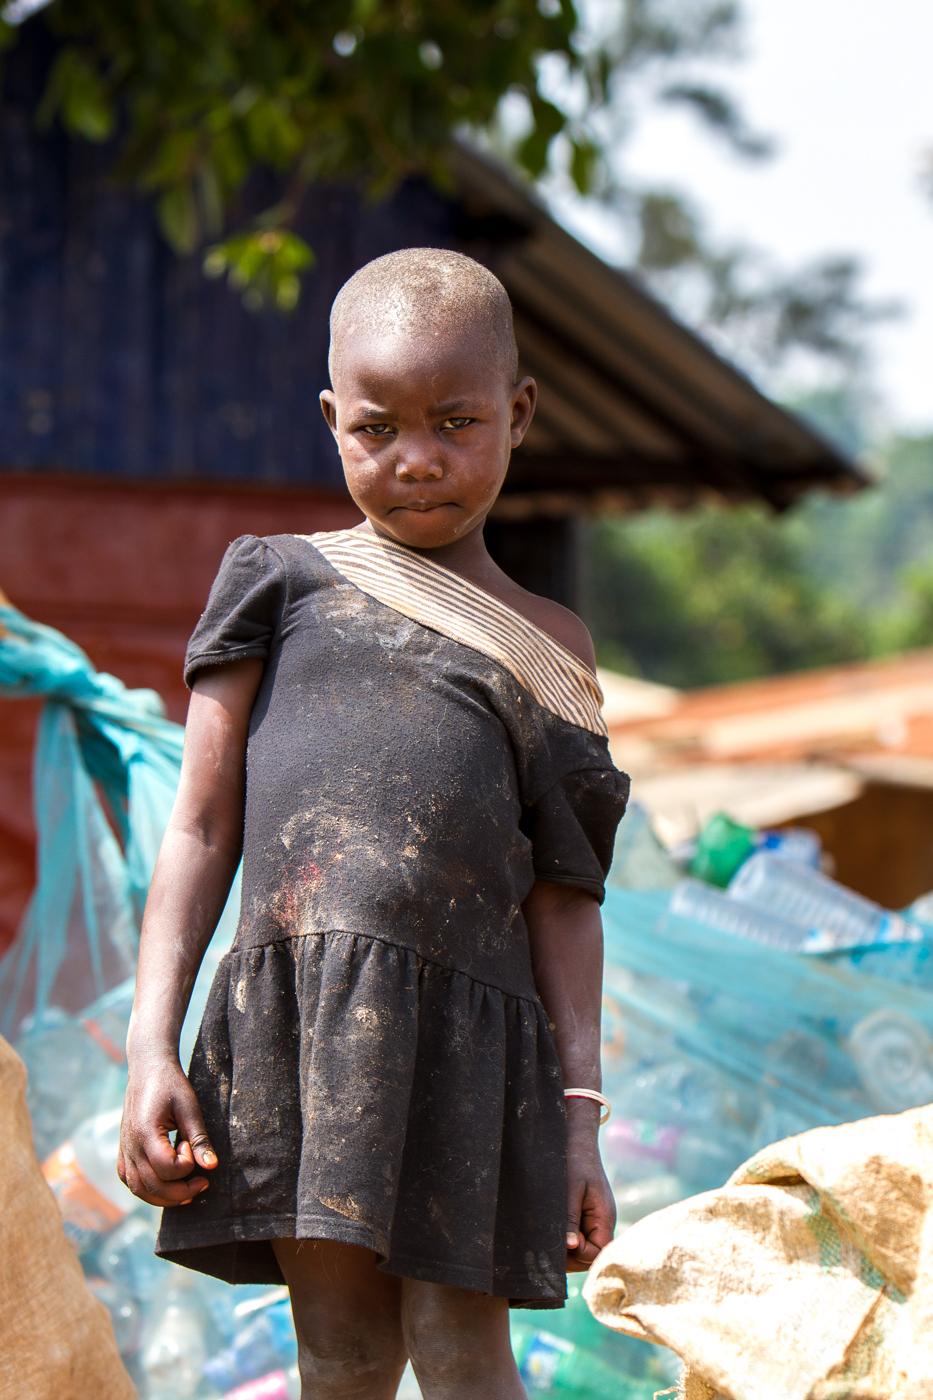 Adam Dickens Photography 2014 - Deki Uganda 490.jpg